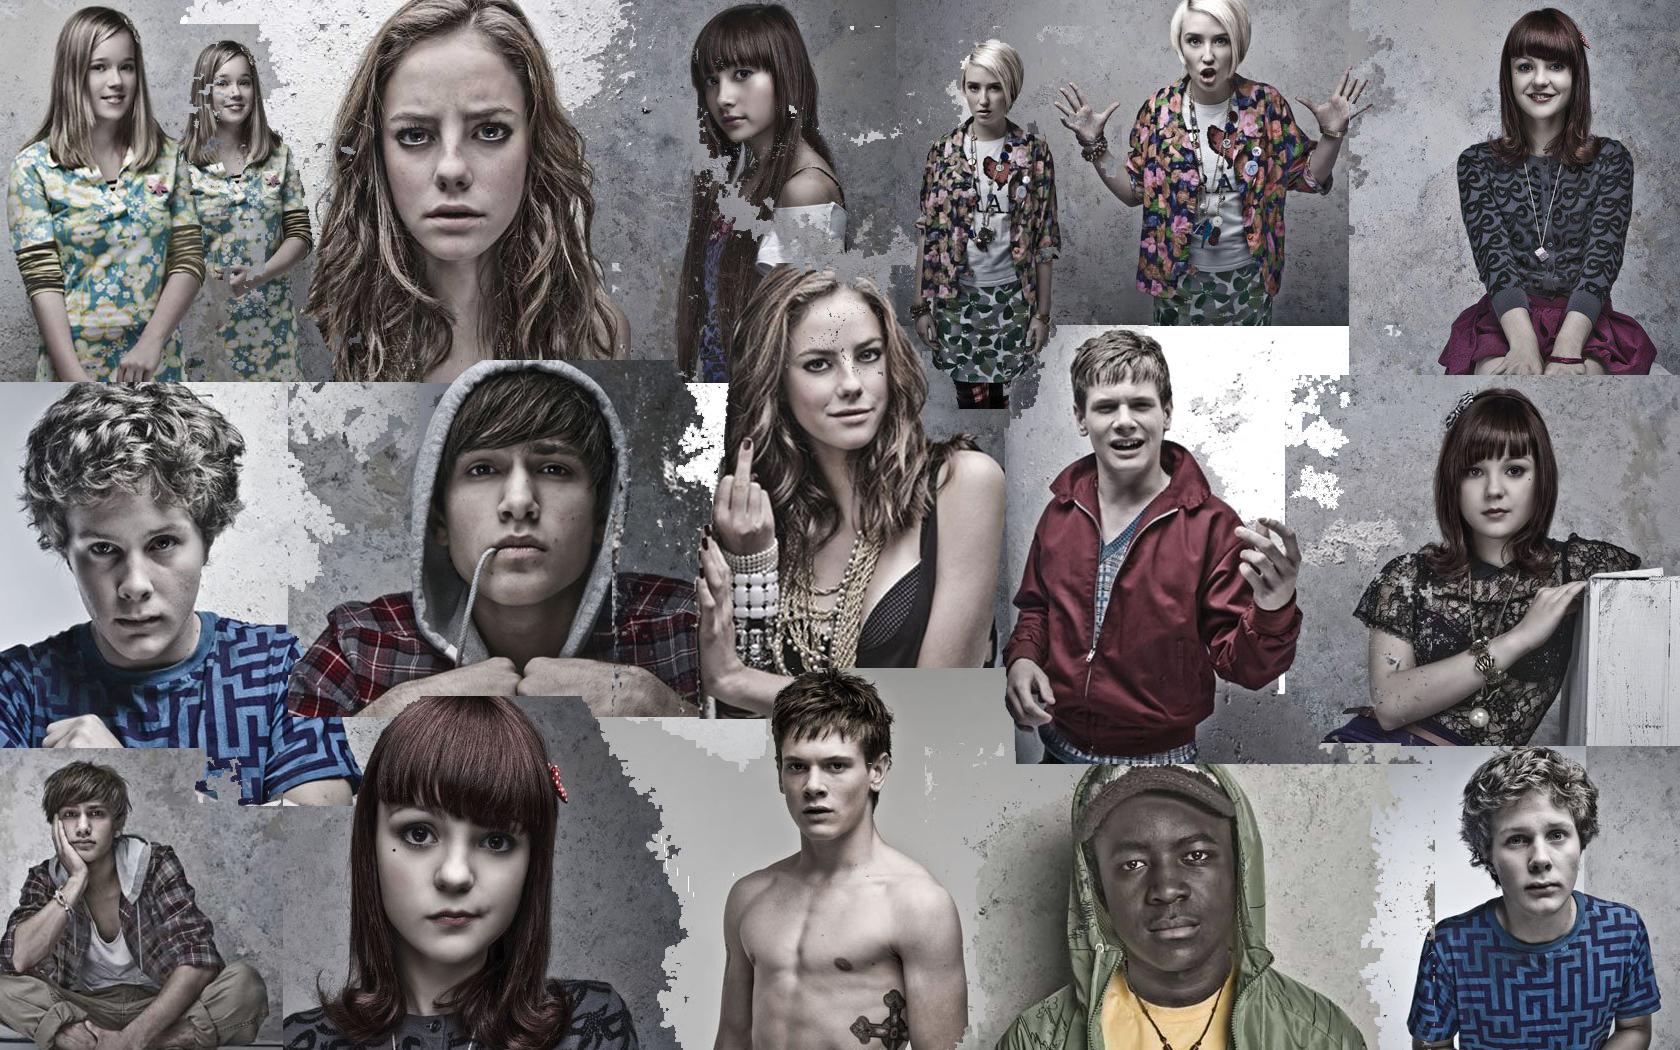 'Skins' Creator Bryan Elsley Says Show May Return Online